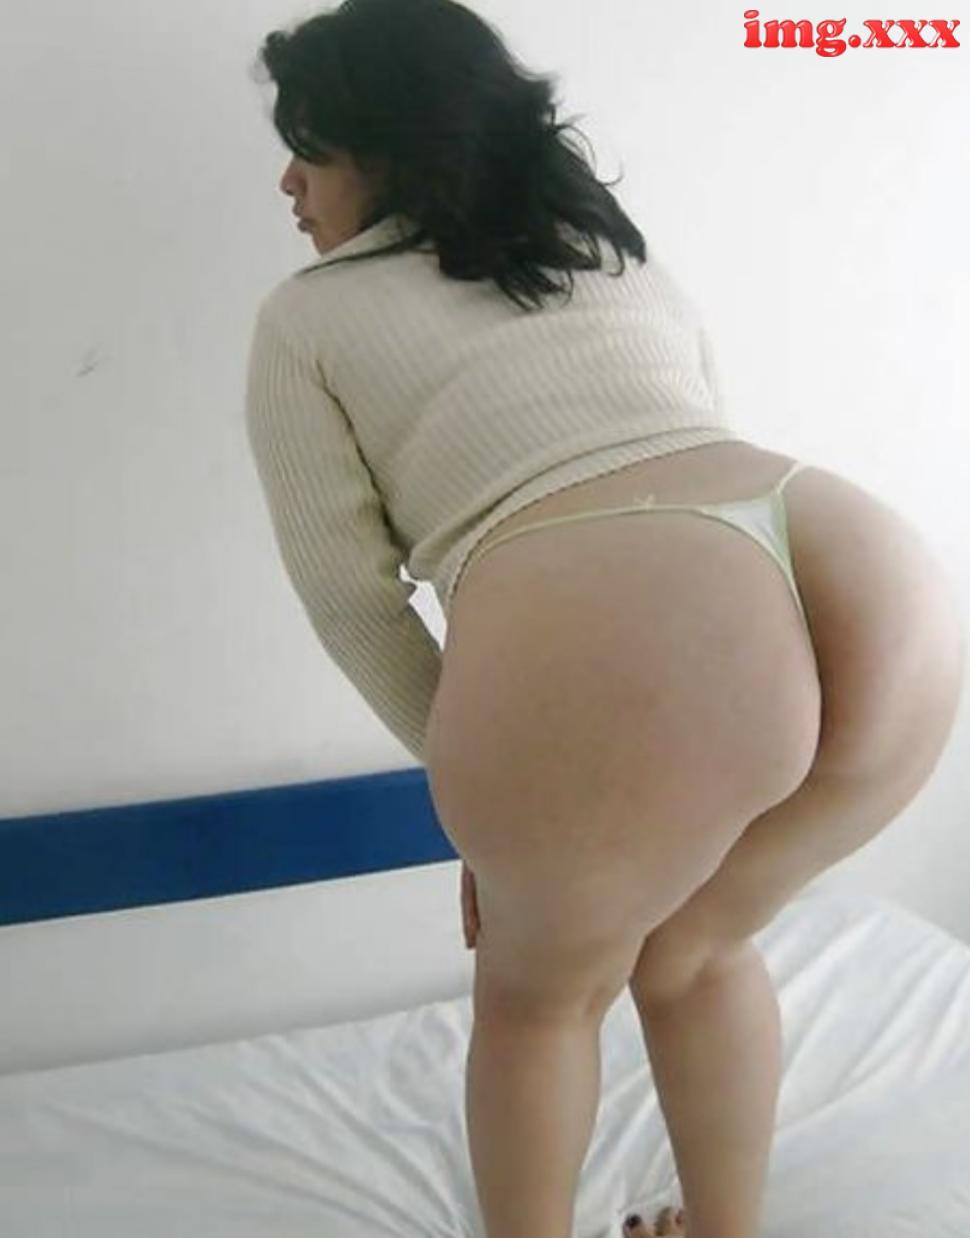 Free sex mexicana